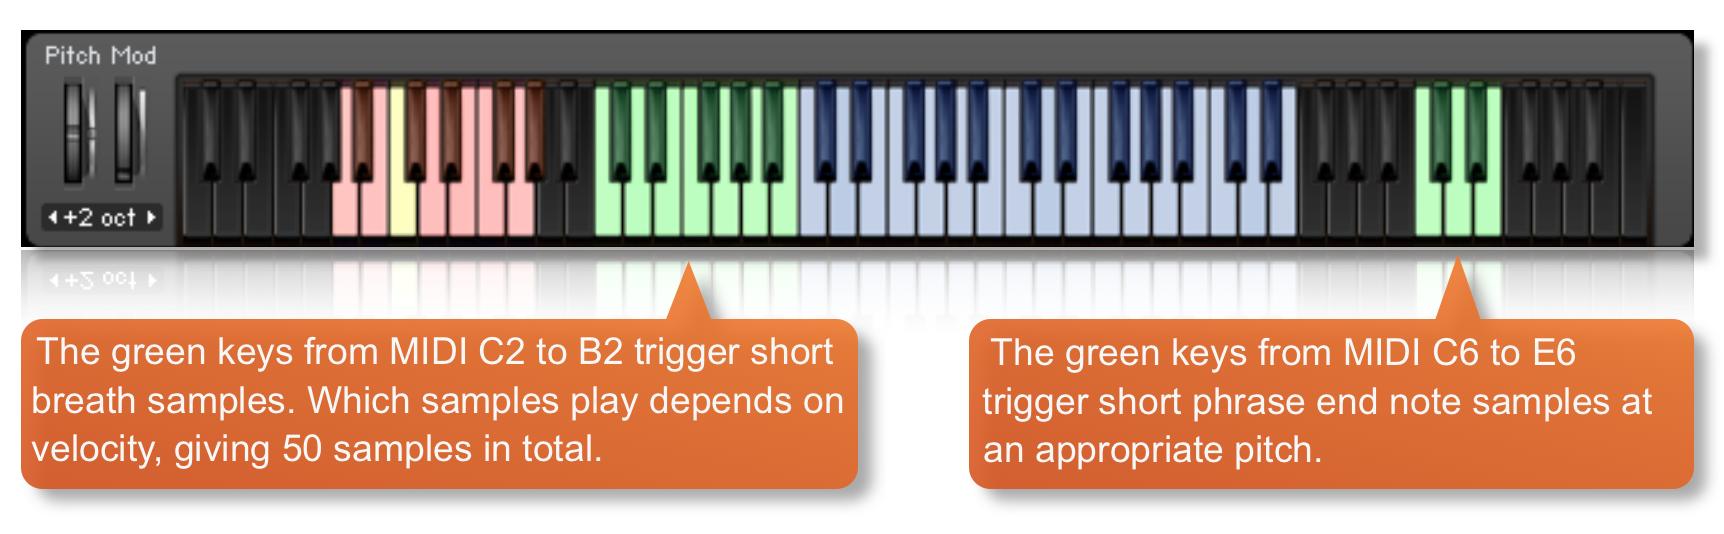 Gediz Keyboard